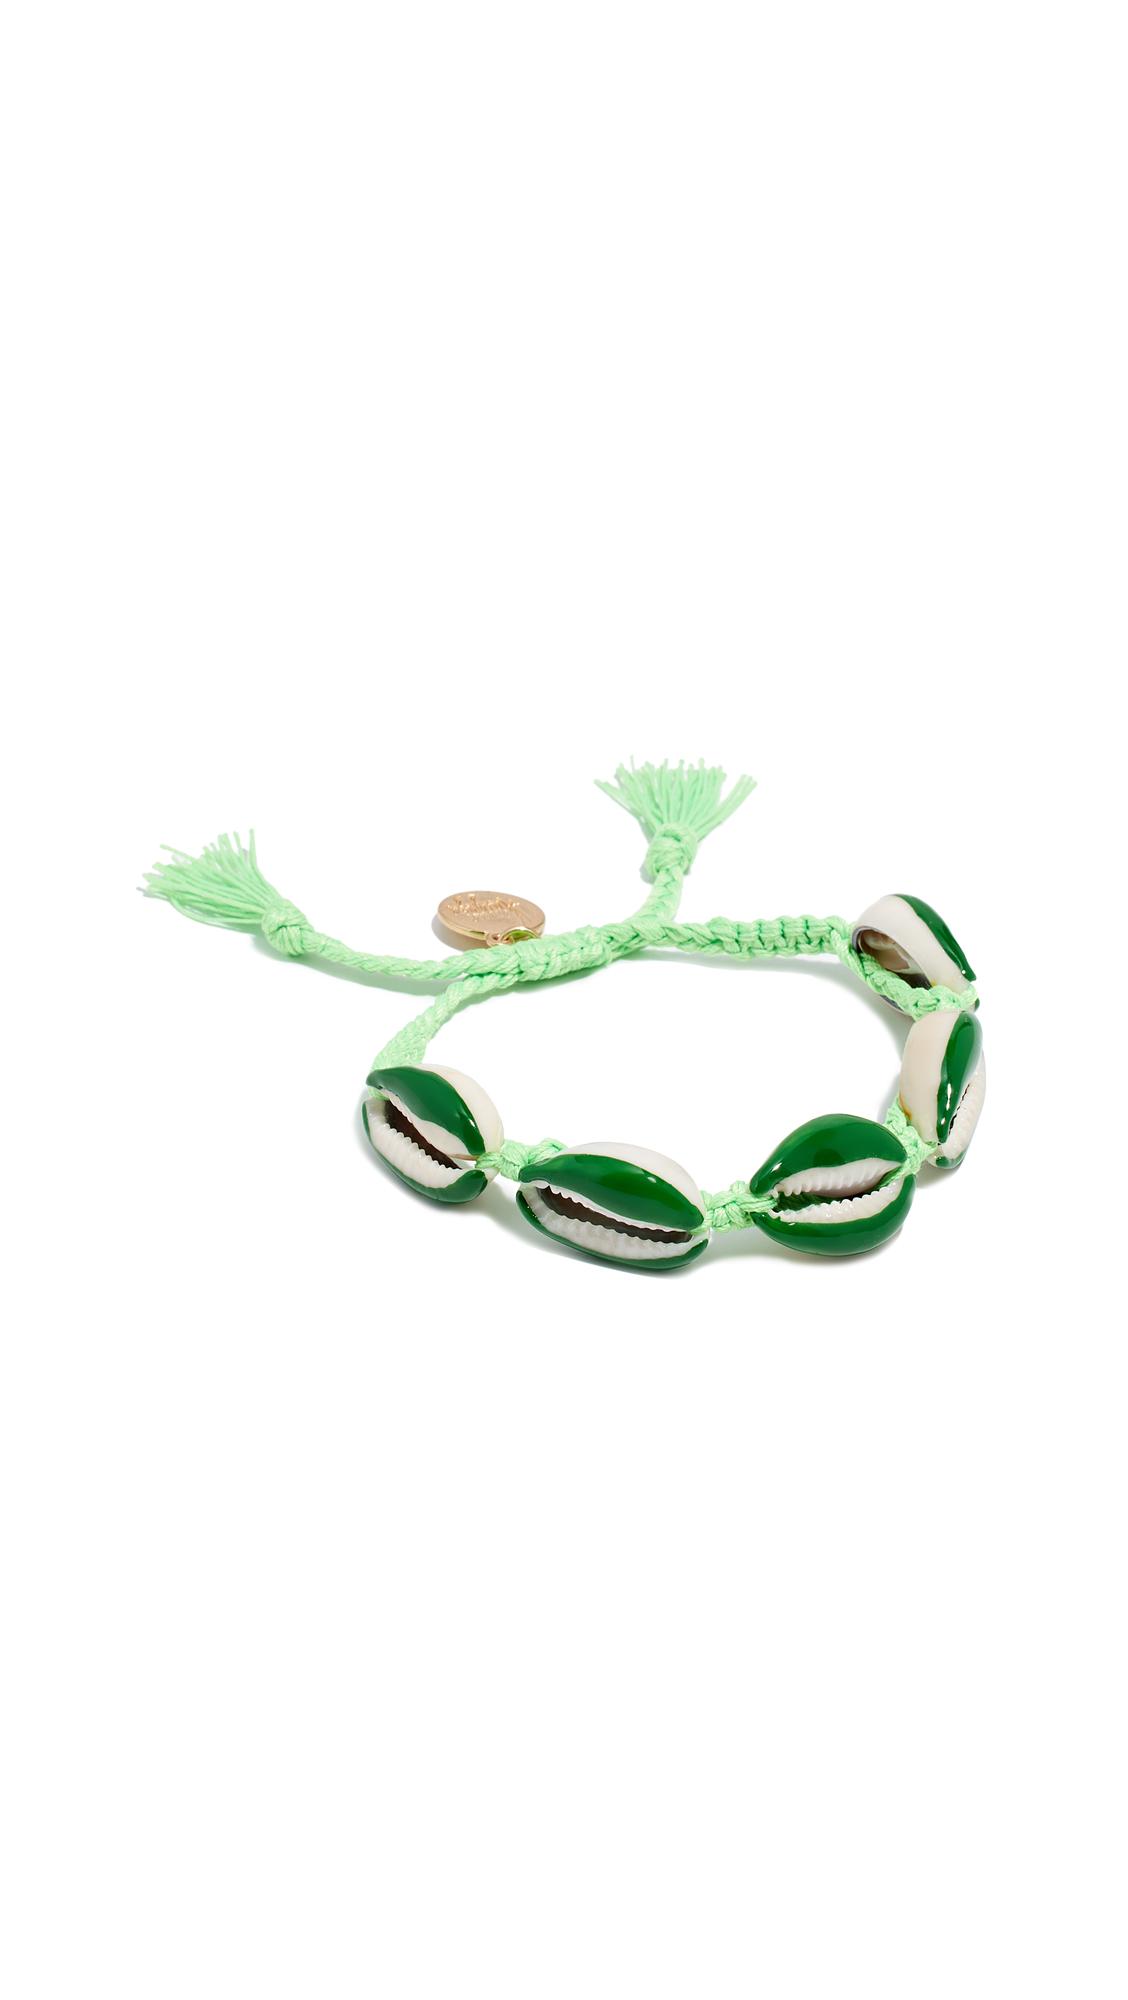 VENESSA ARIZAGA Neon Shell Bracelet in Green